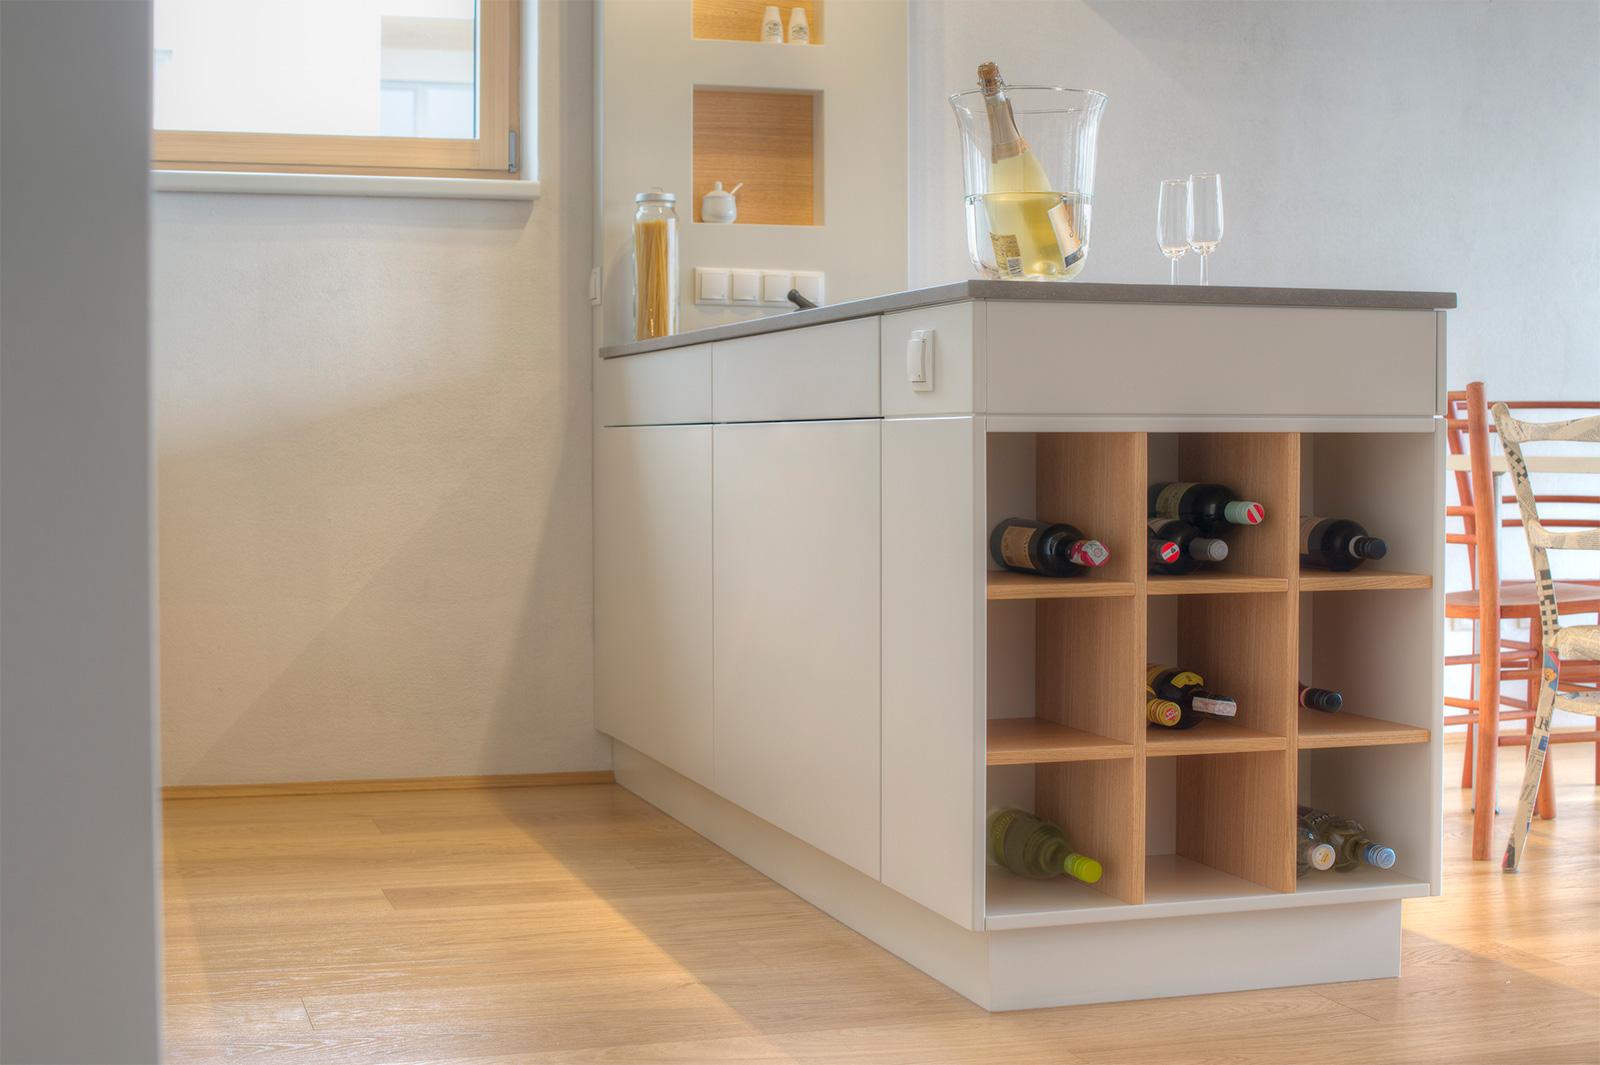 weinregal k che ikea weinregale ikea. Black Bedroom Furniture Sets. Home Design Ideas